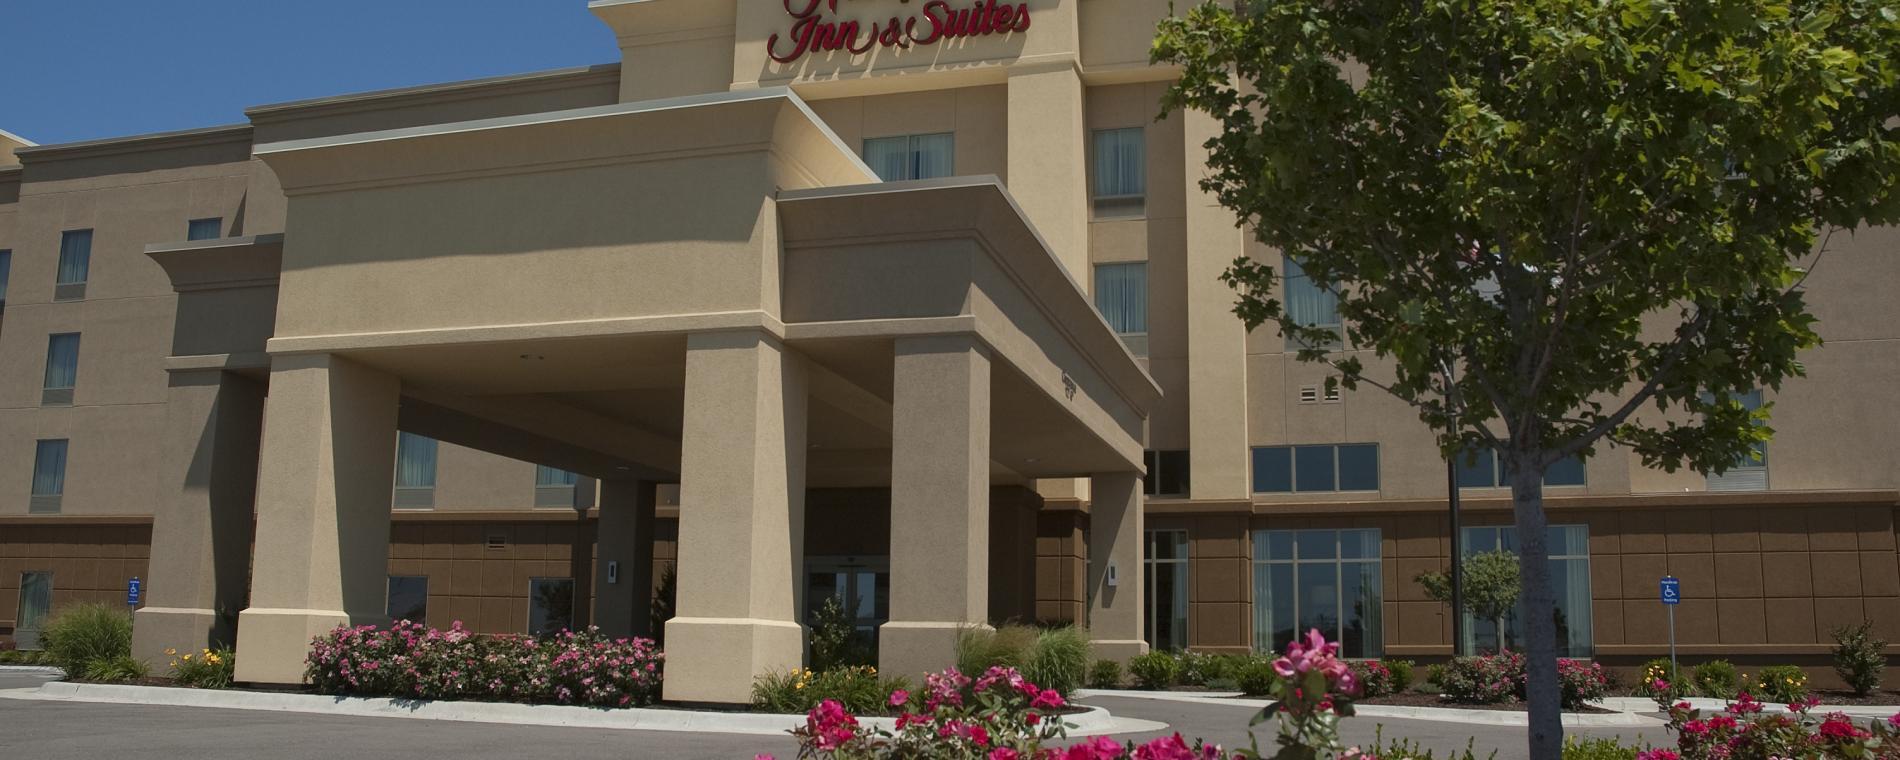 Hampton Inn NE Exterior Visit Wichita